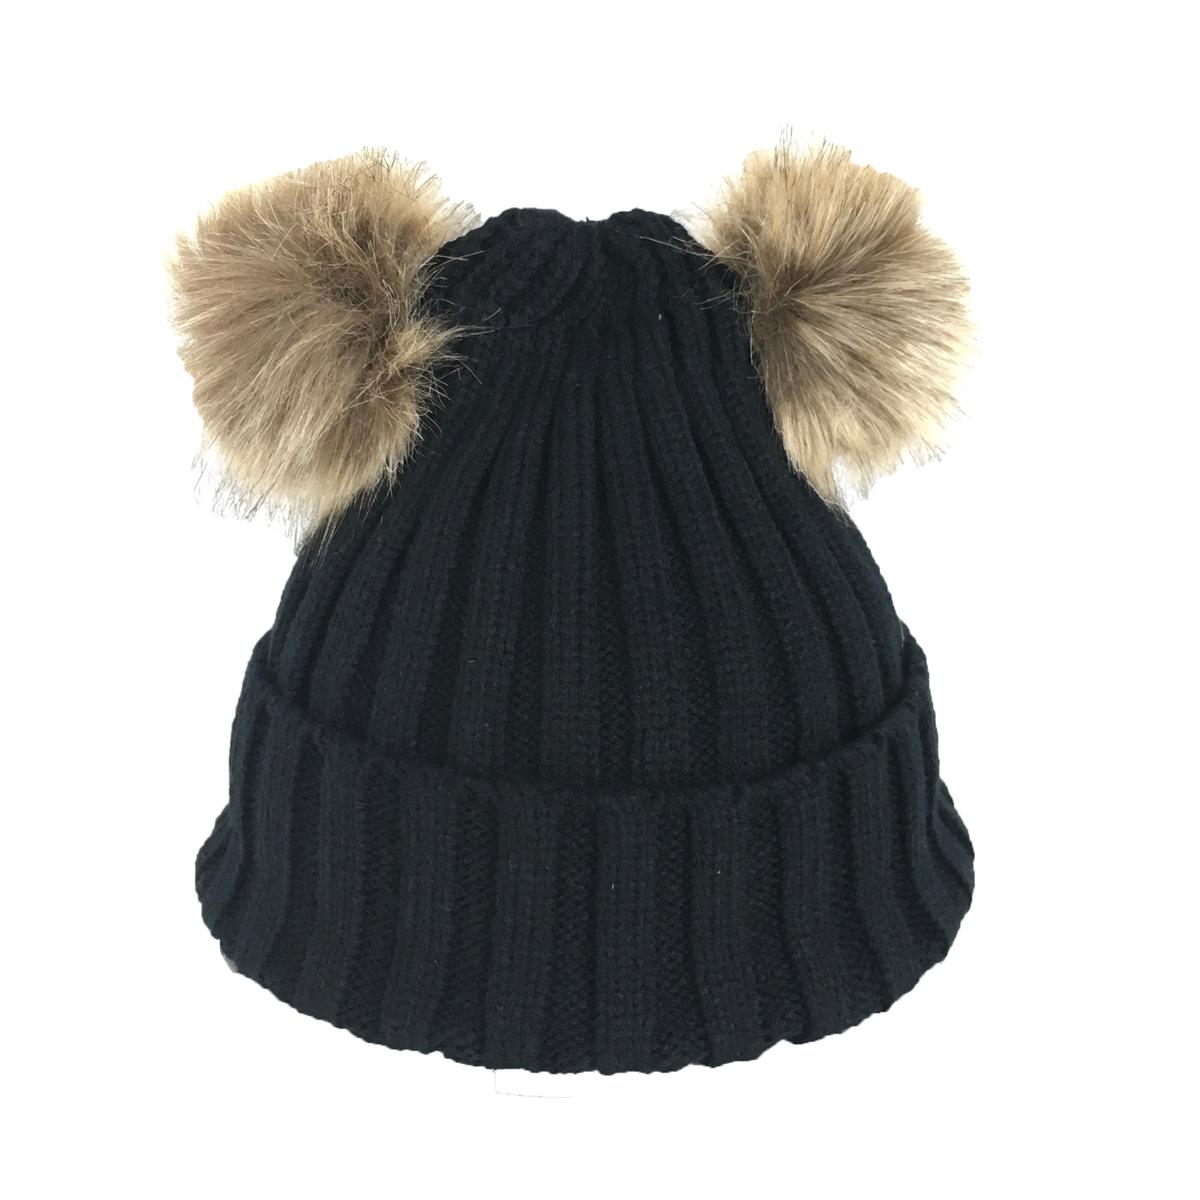 7540c4d3a5ce7 Fashion Culture Double Pom Pom Beanie Hat